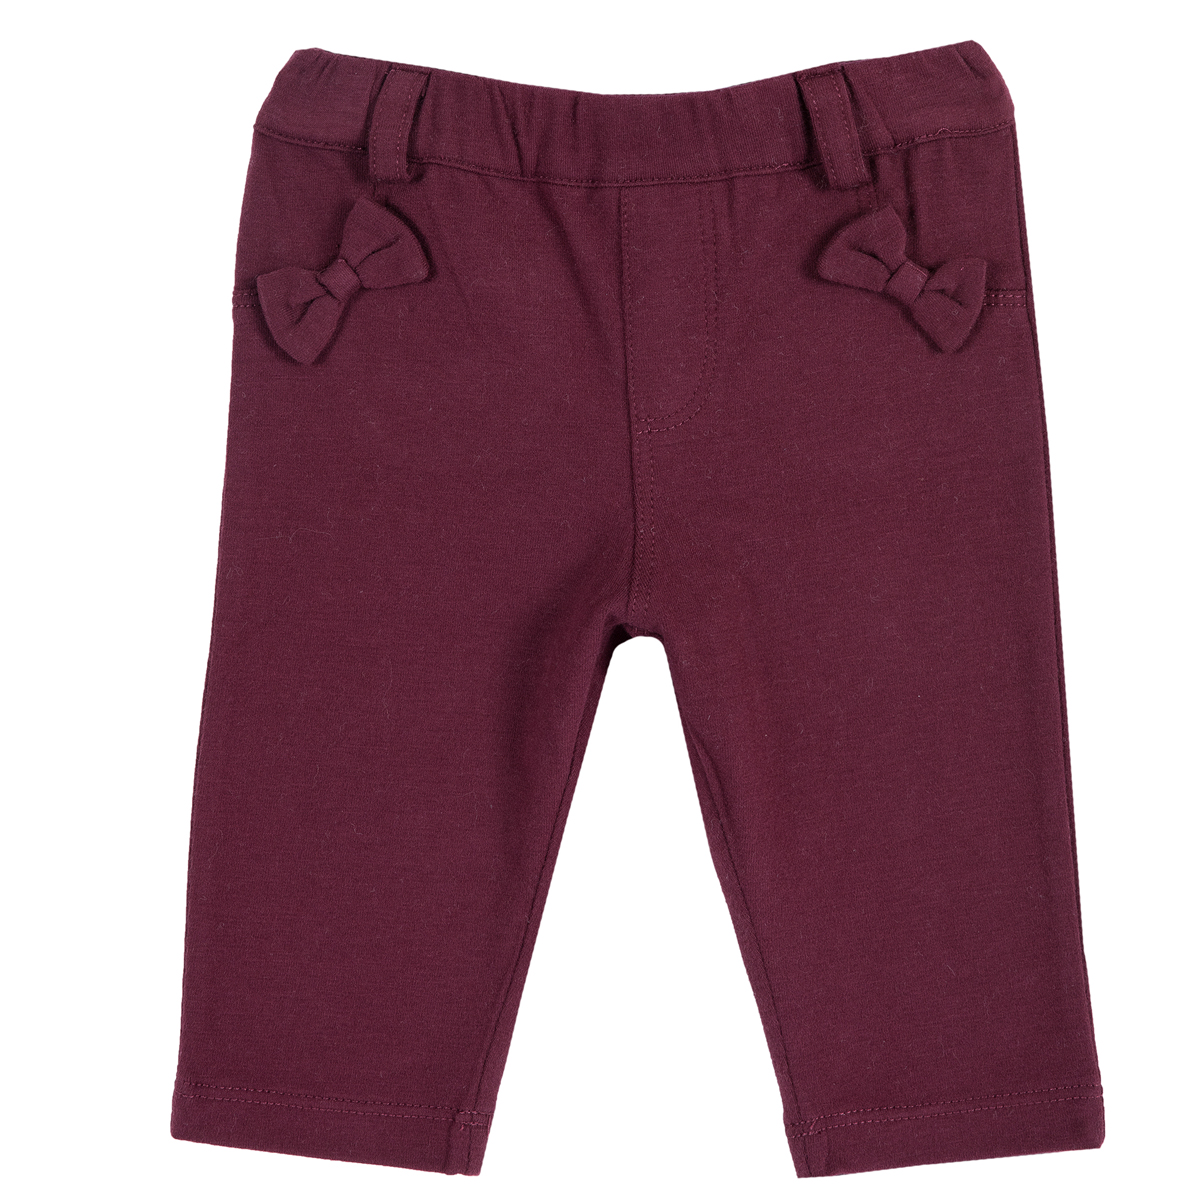 Pantaloni Lungi Copii Chicco, Fundite Decorative, 08036